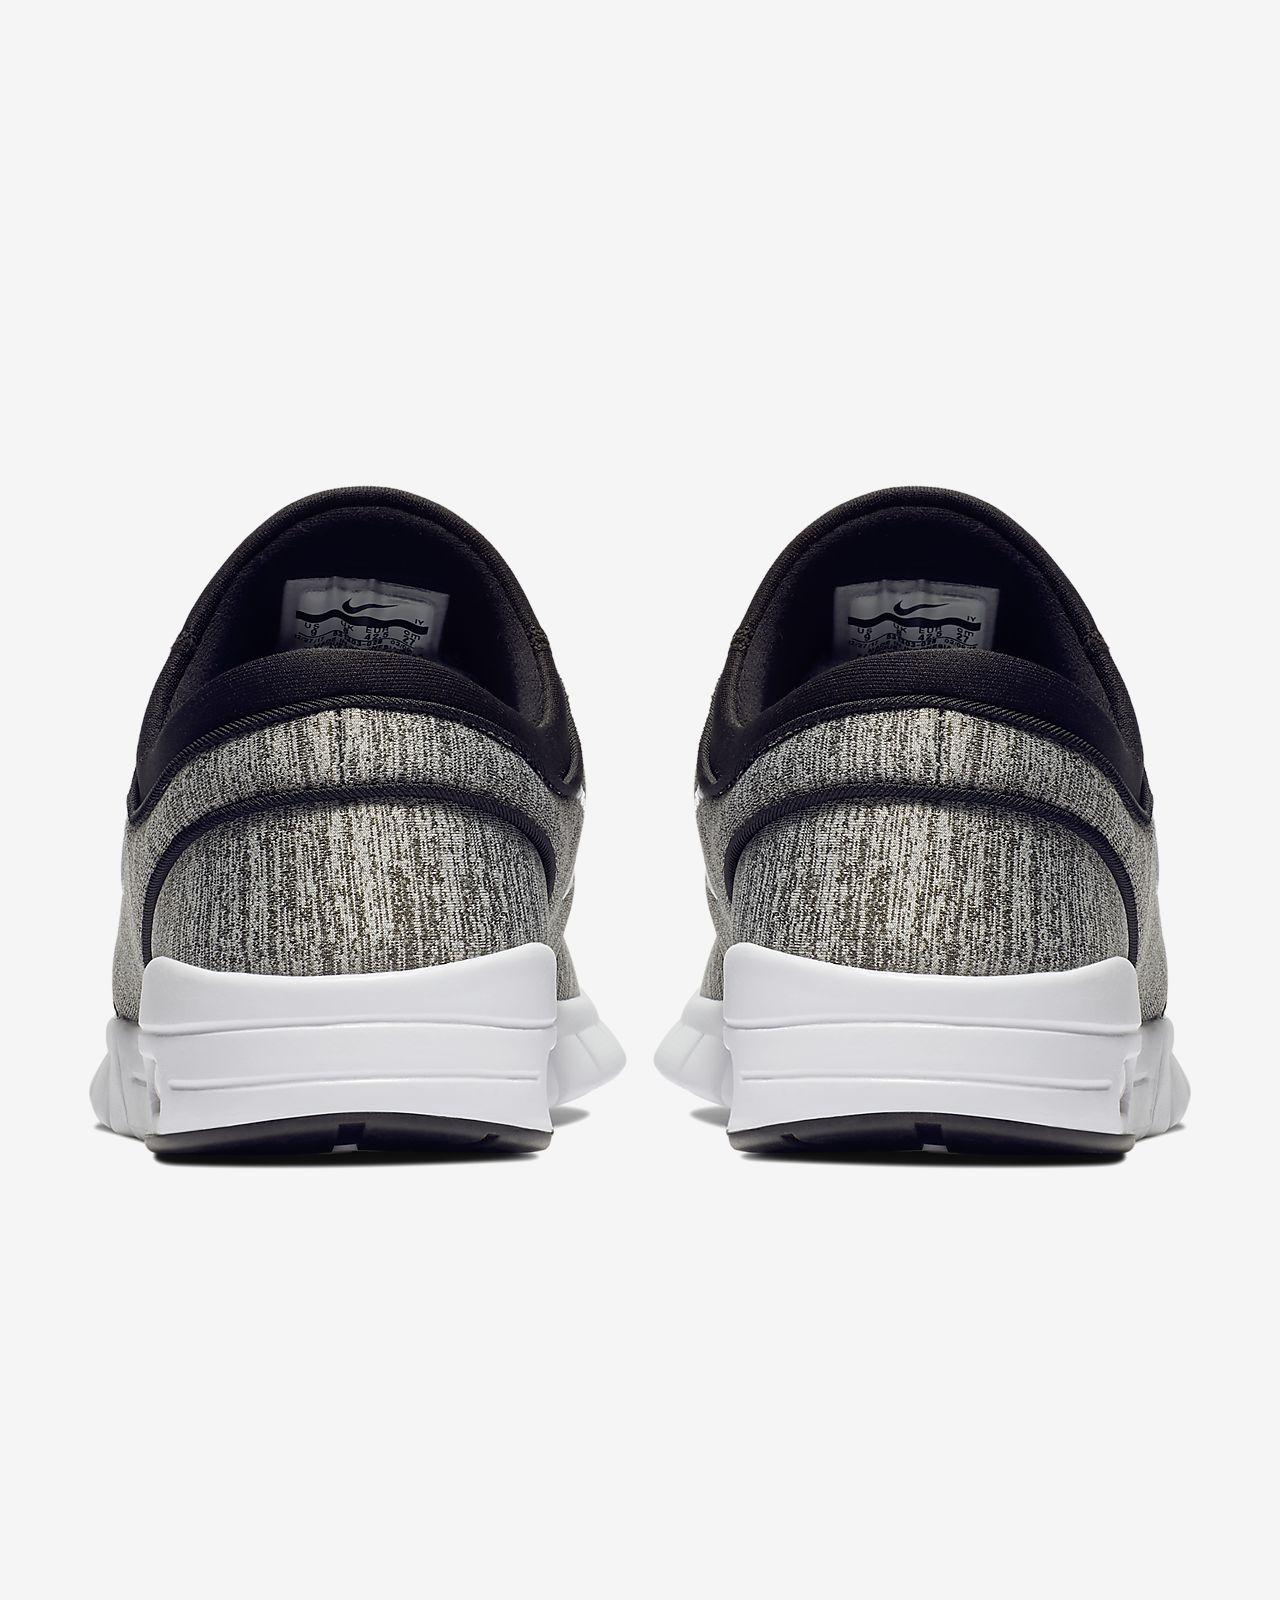 35d9061ae4 Nike SB Stefan Janoski Max Skate Shoe. Nike.com